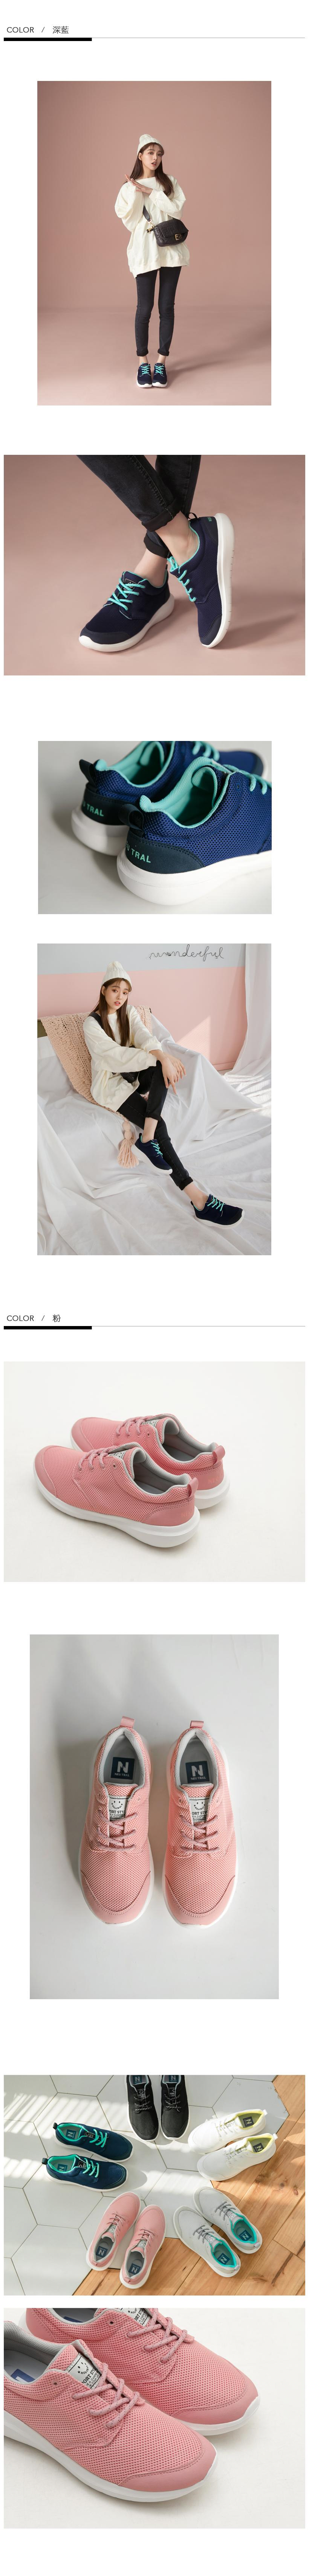 NeuTral-防潑水超輕撞色休閒鞋(灰)-男女款